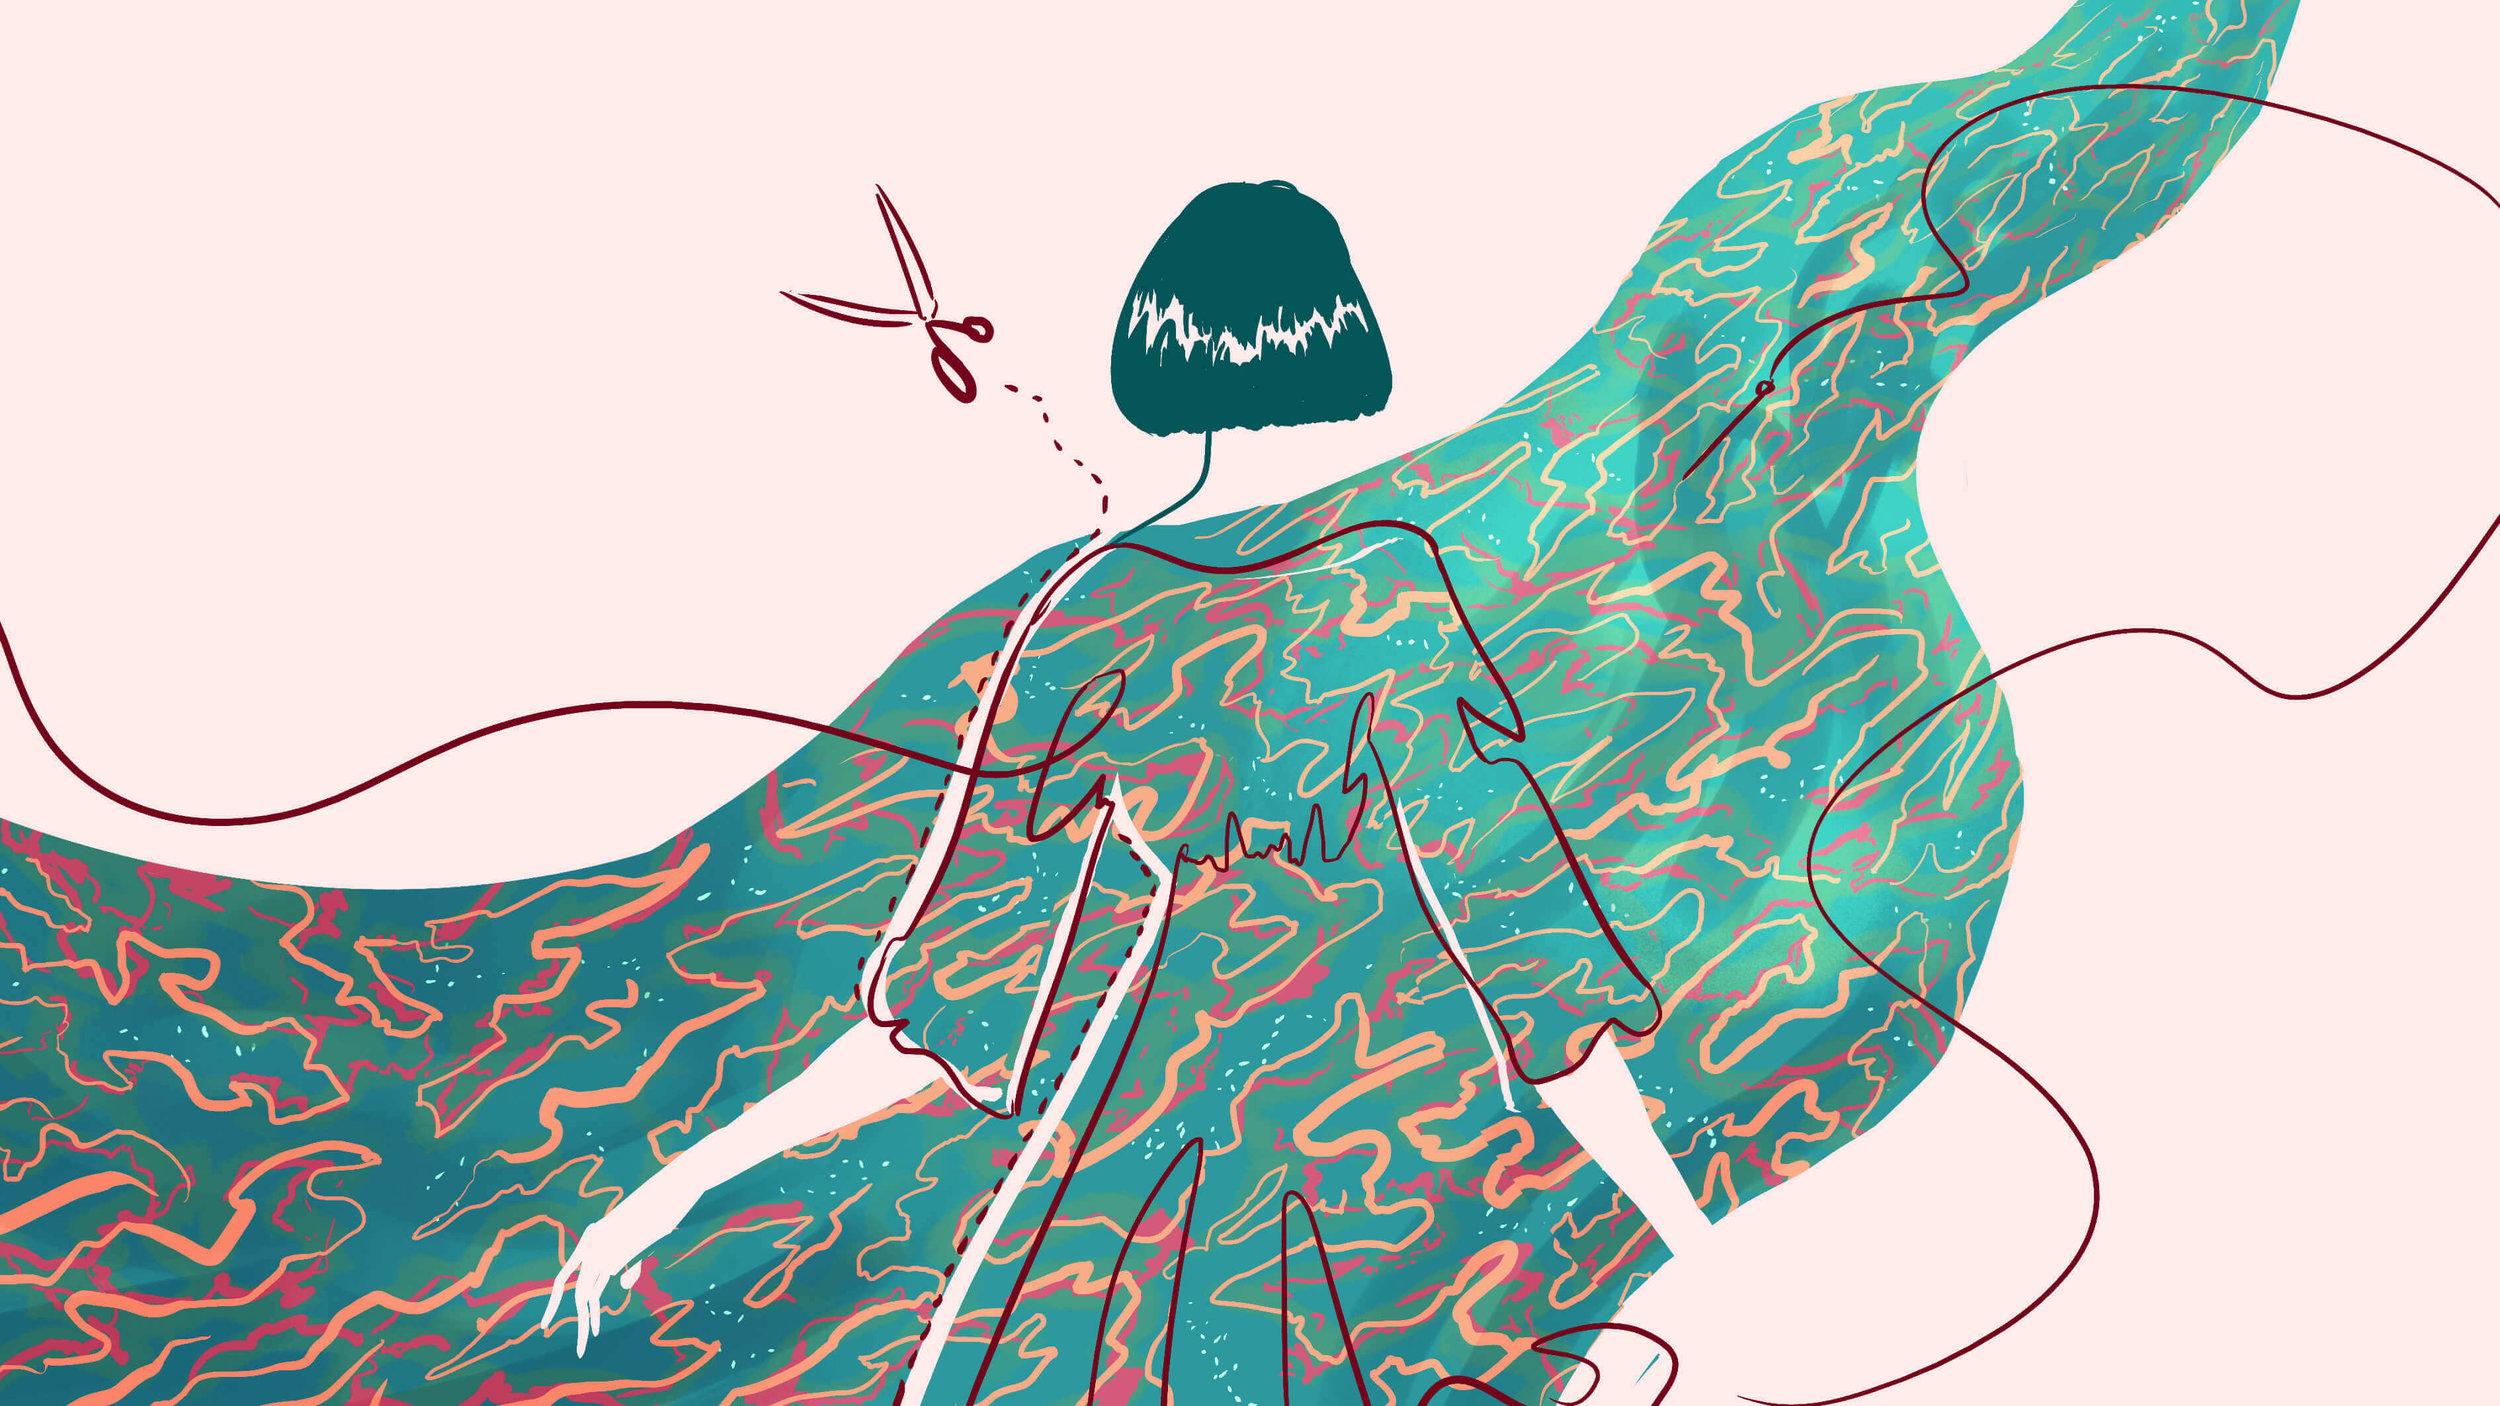 Jon-Mccormack-illustration-Underpinned.jpg